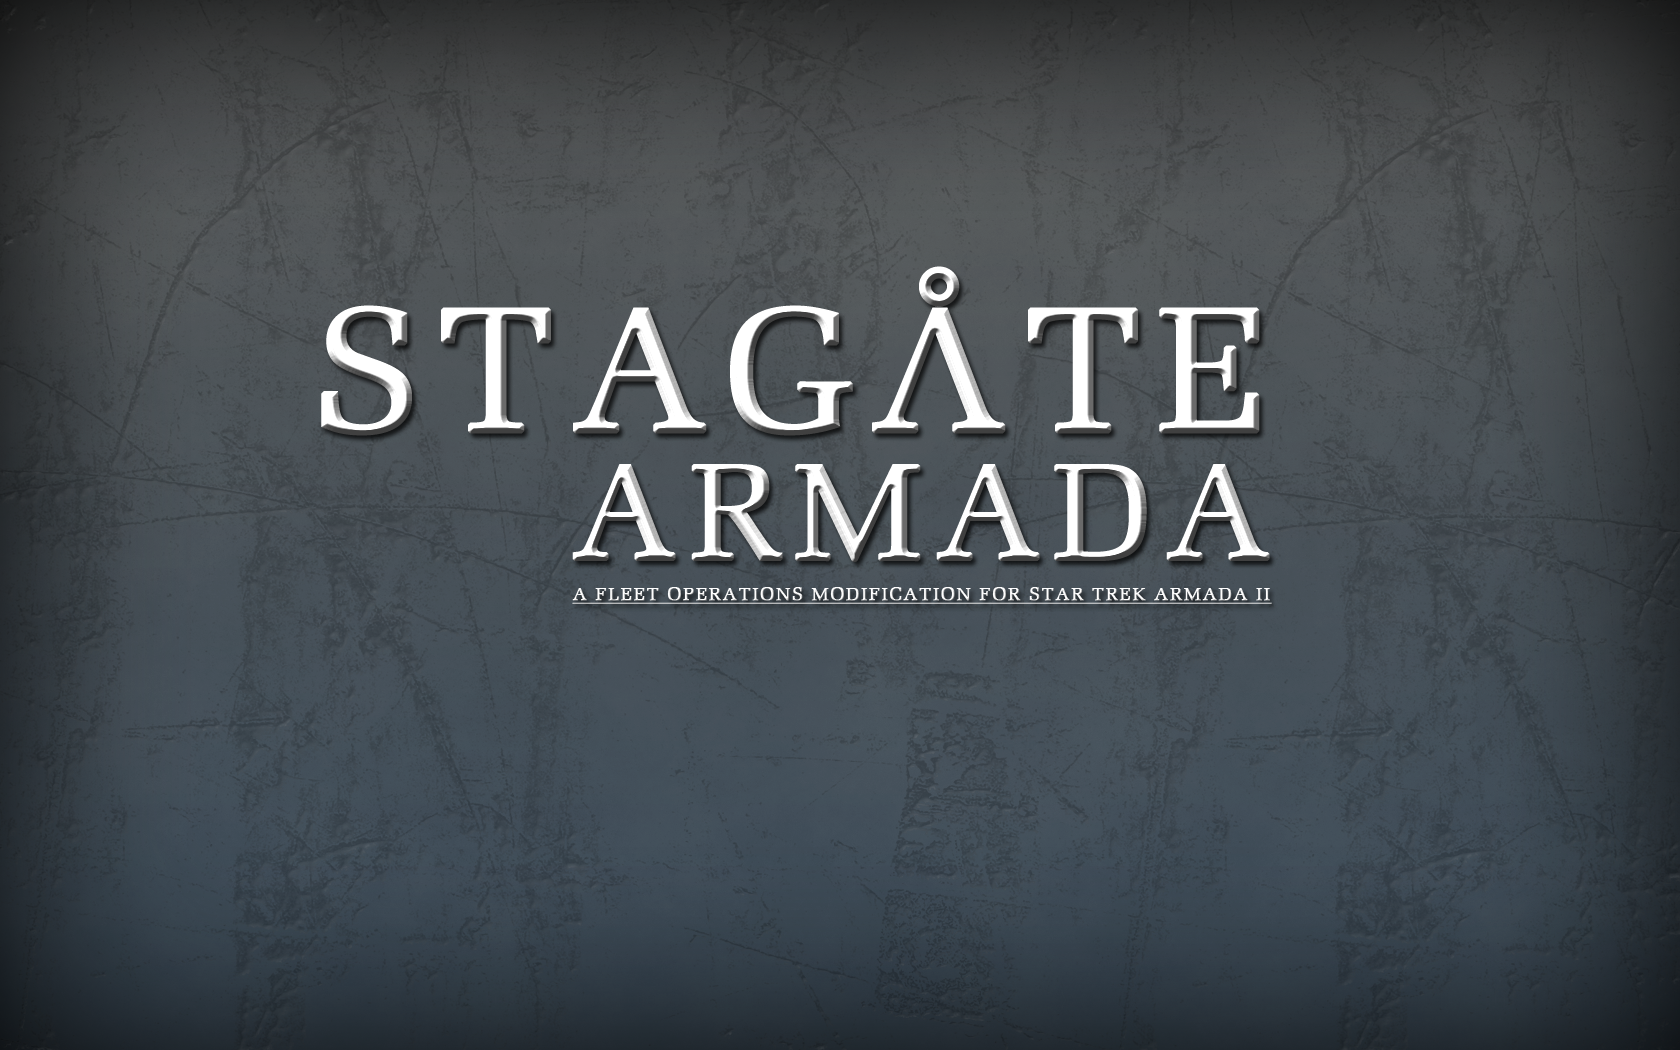 Stargate Armada Wallpaper by Majestic-MSFC